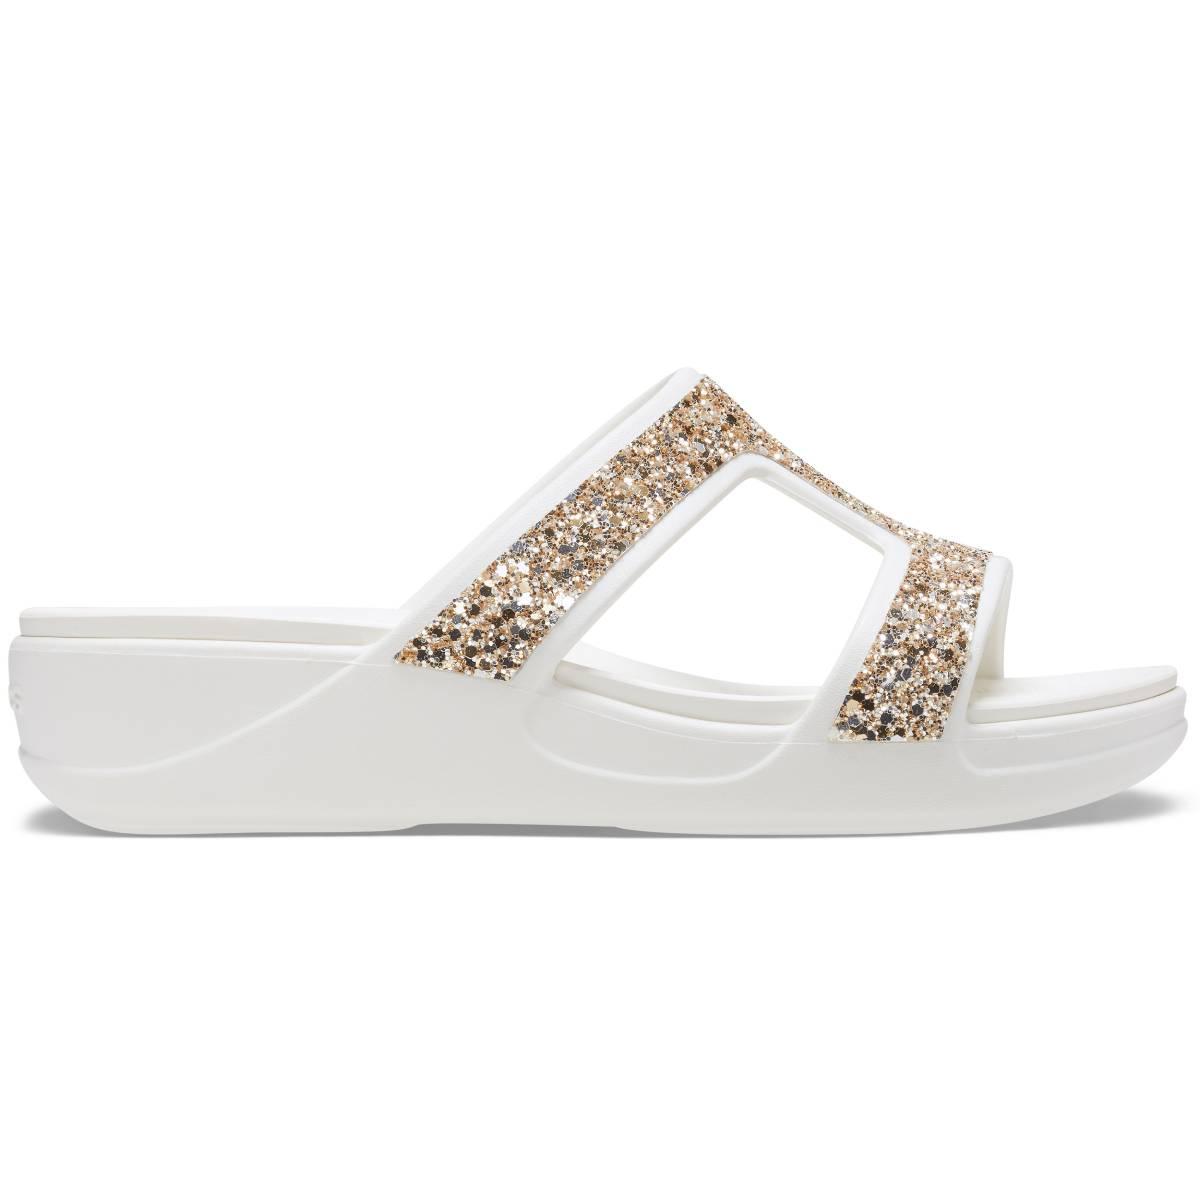 Crocs Monterey Glitter Slip On Wdg - Çok renkli